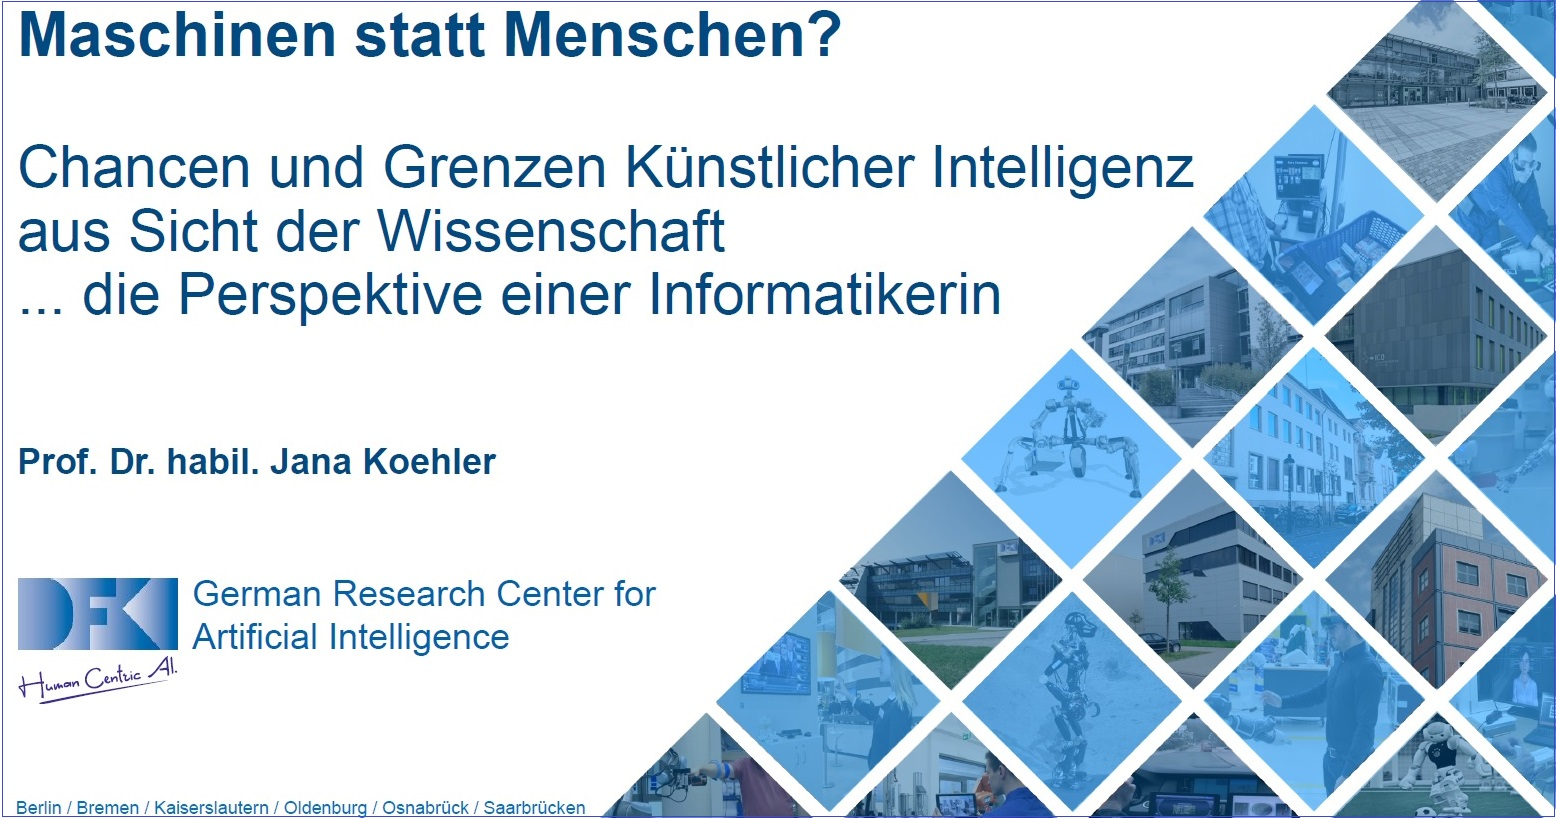 https://dhv.eventprovider.org/backend/files/public/DHV-Symposium_2019/Titelseite_Vortrag_Koehler.jpg